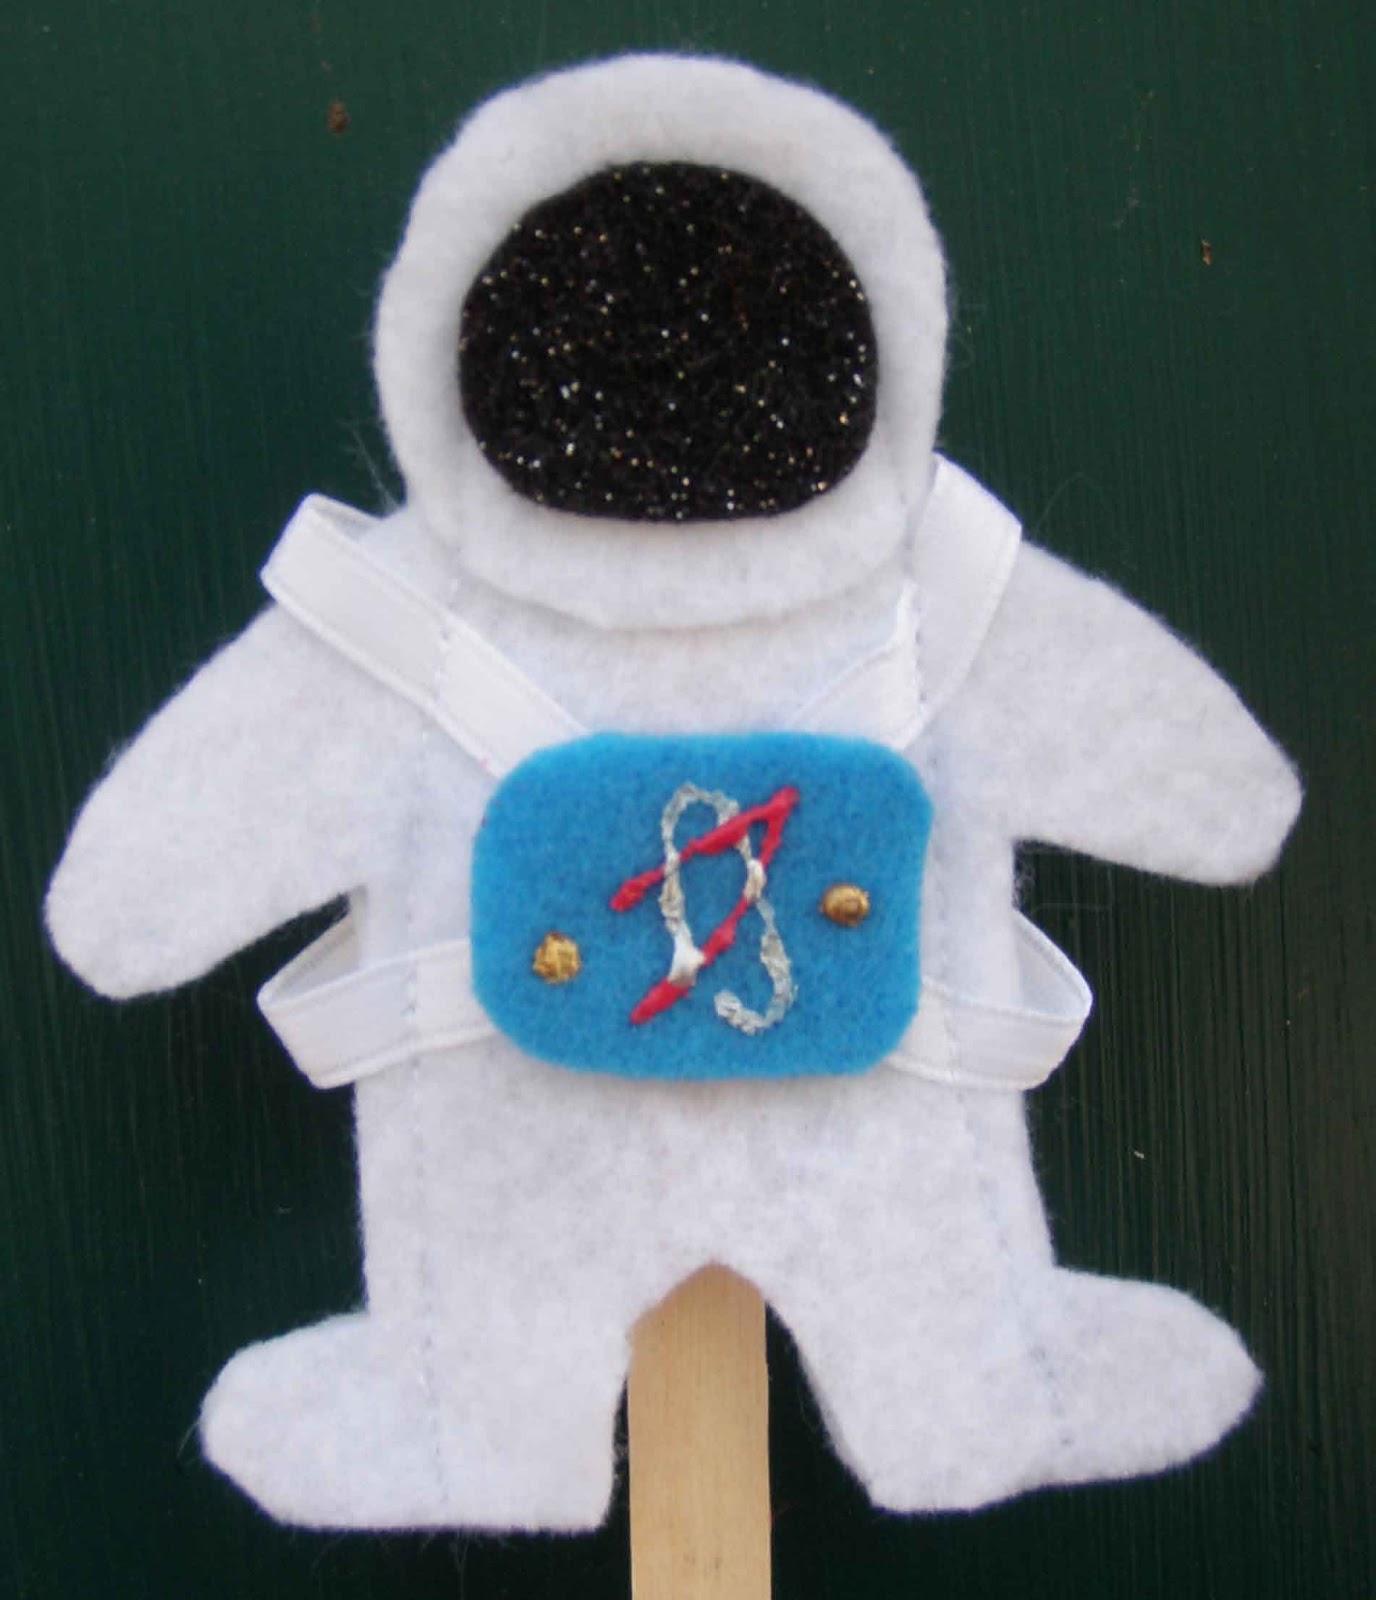 astronaut vest crafts - photo #32